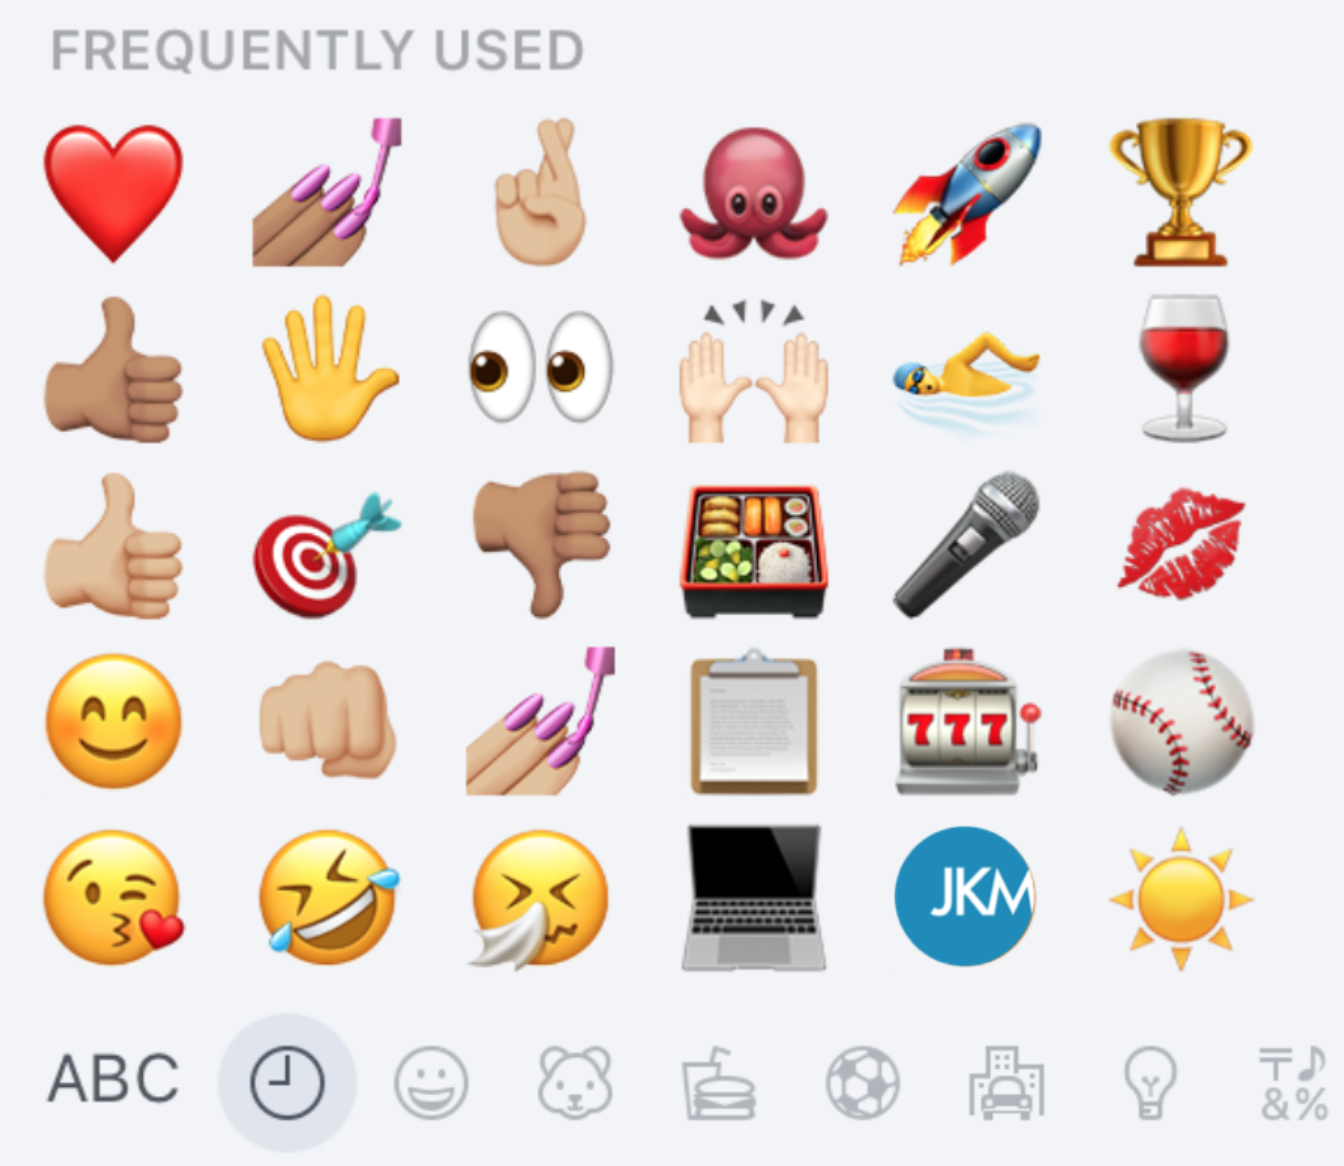 World Emoji Day The Cornerstone of Social Media Tools